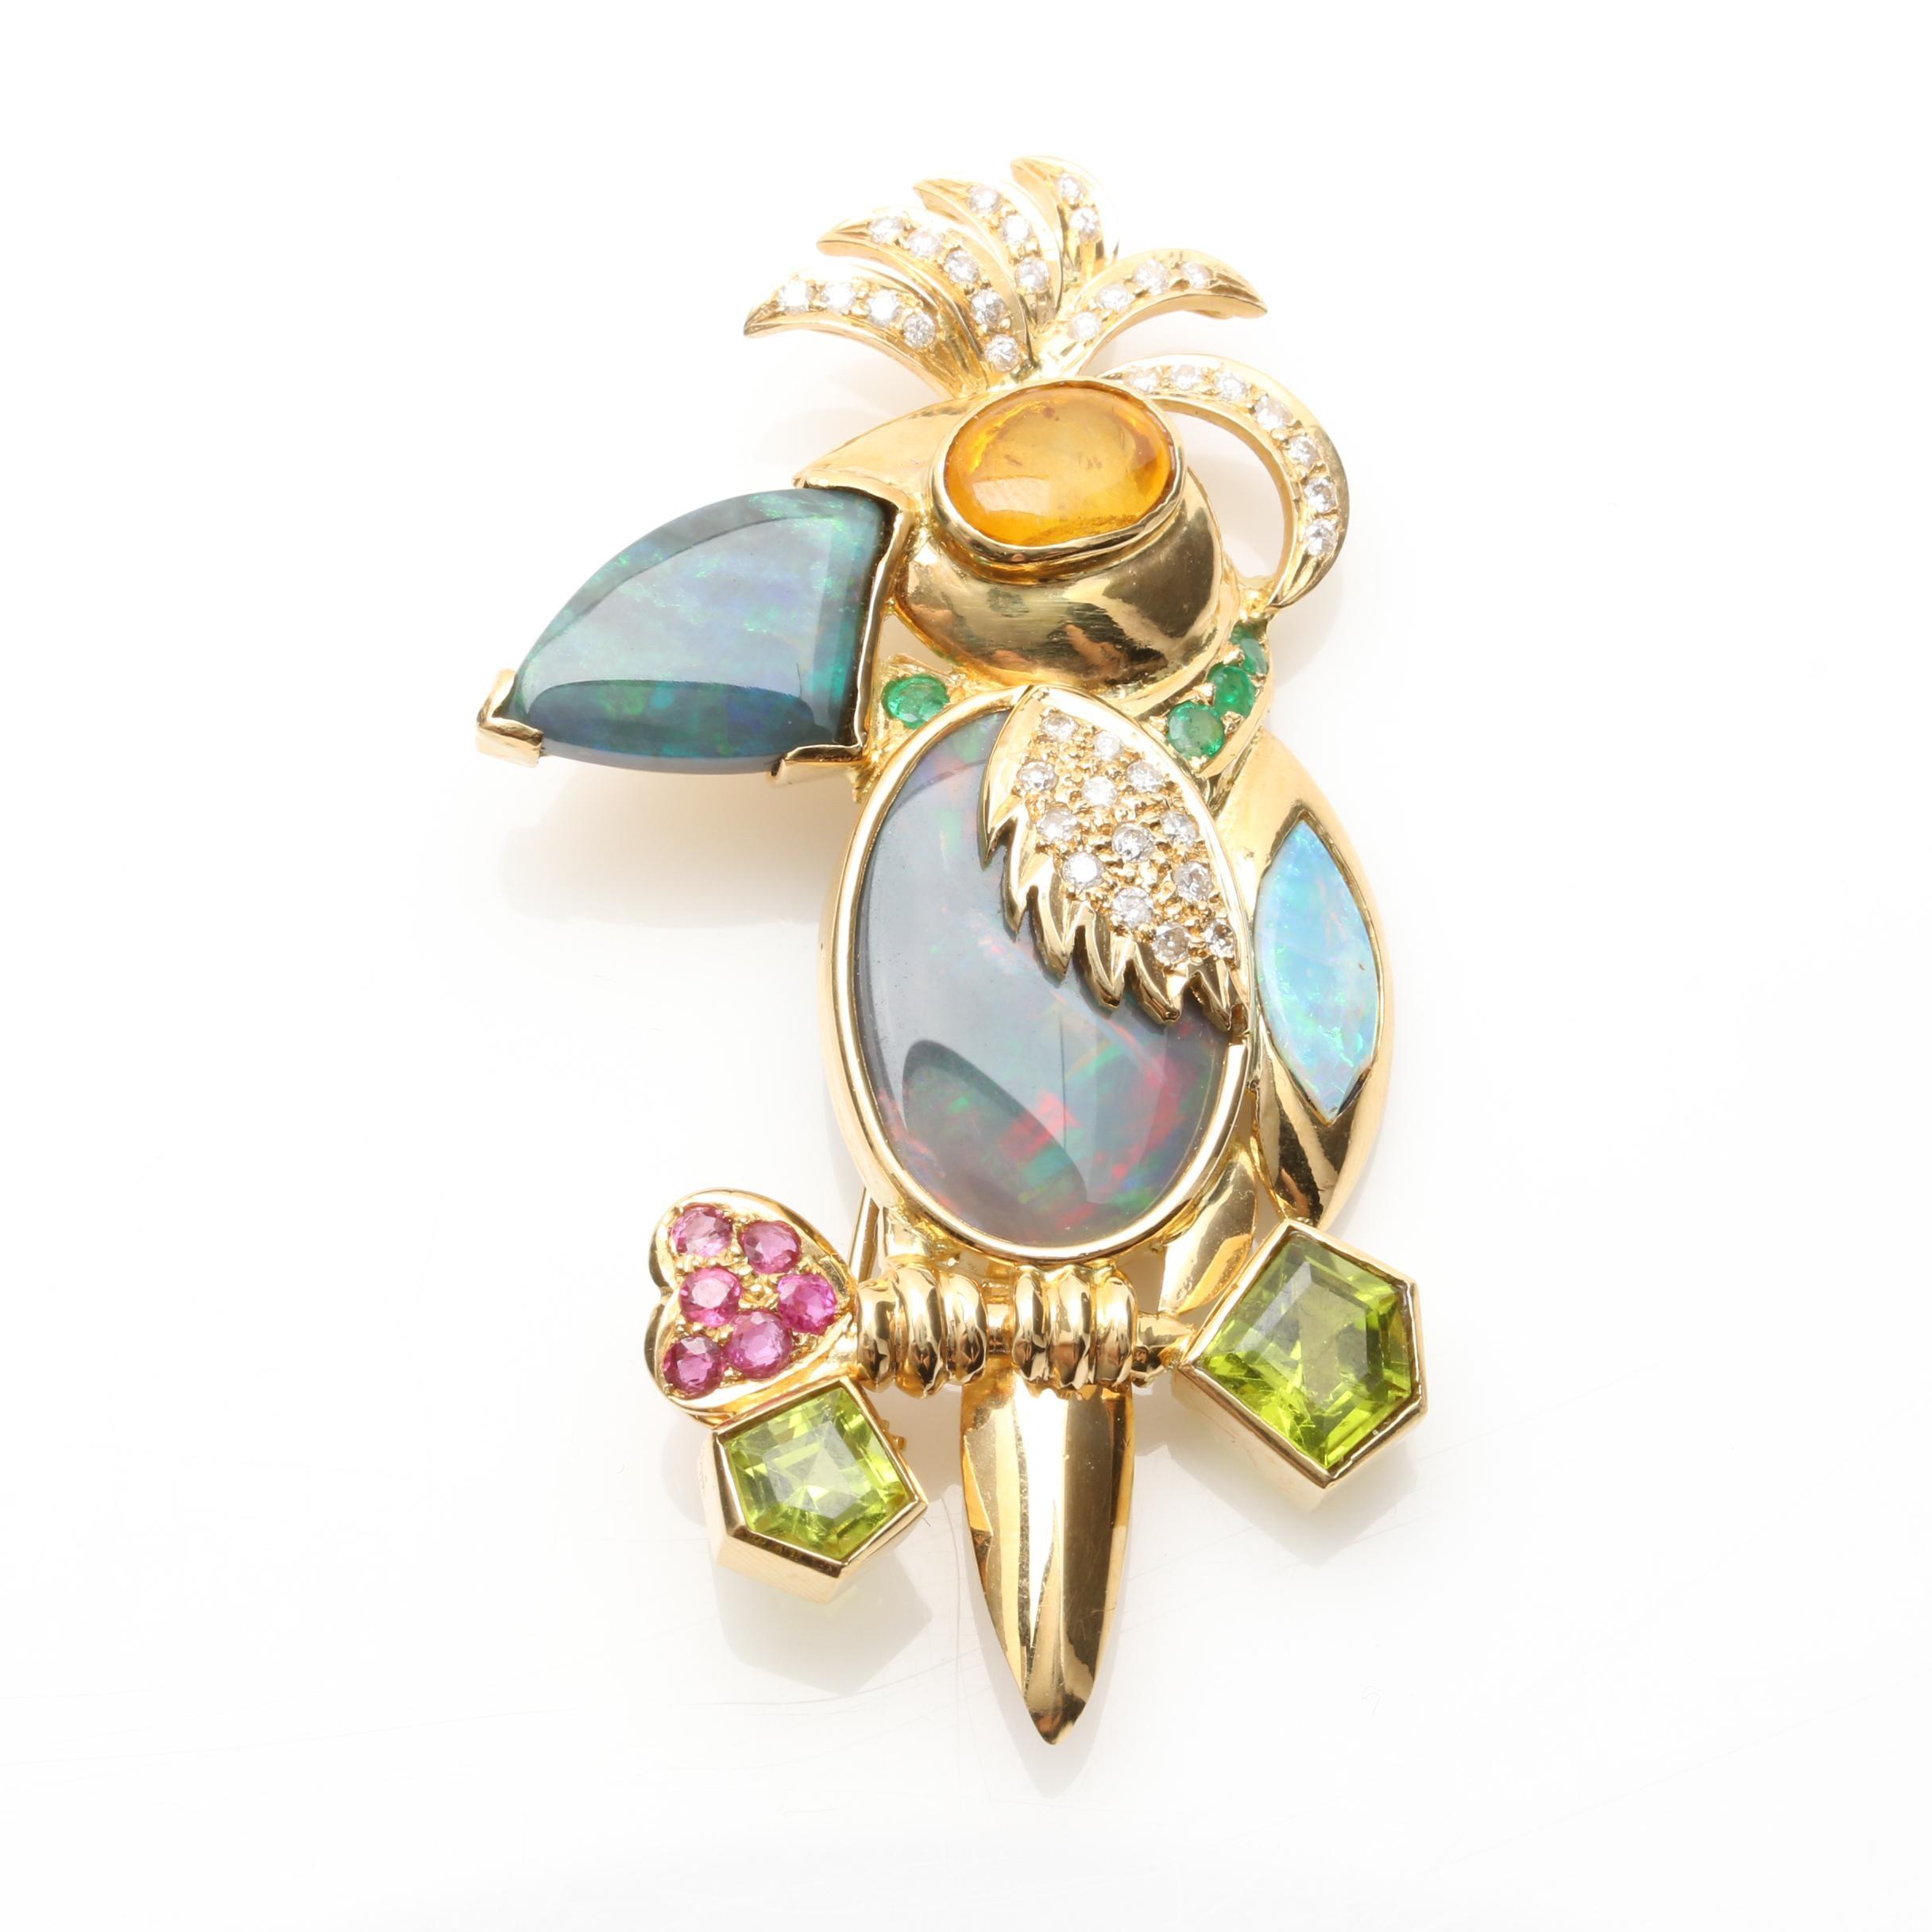 18K Yellow Gold Opal, Ruby, Emerald, and Diamond Toucan Bird Brooch